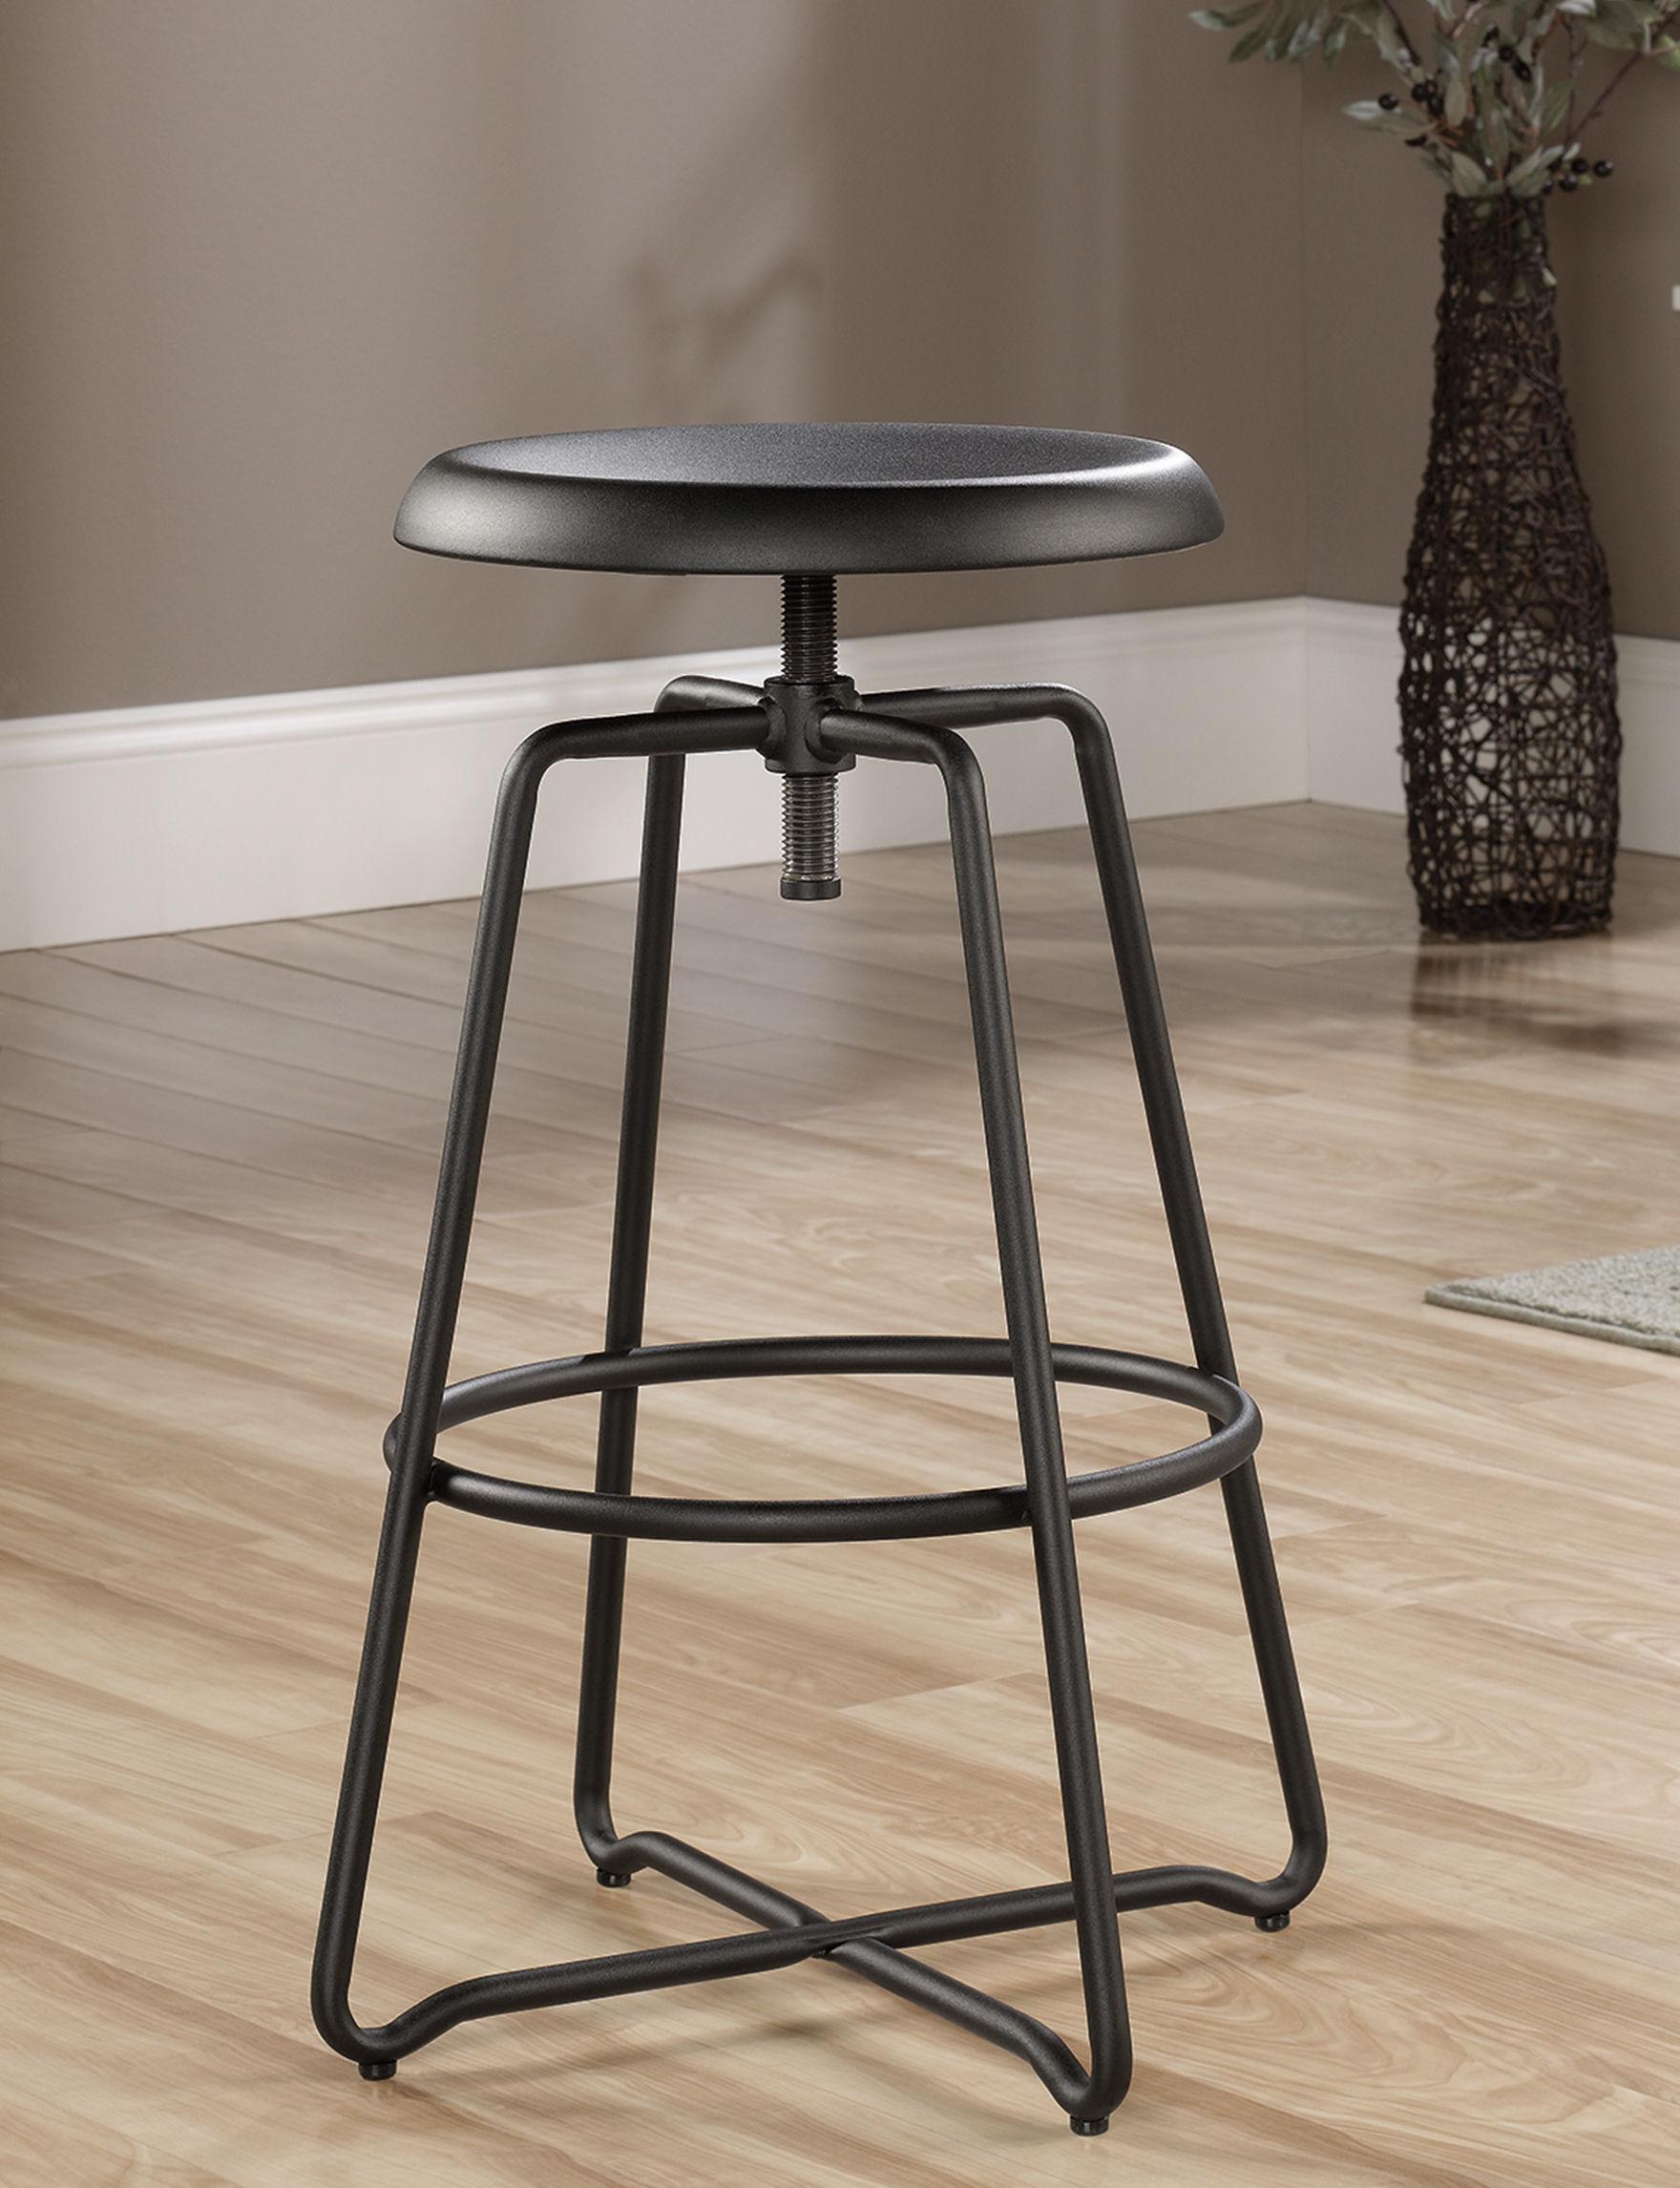 Sauder Black Bar & Kitchen Stools Kitchen & Dining Furniture